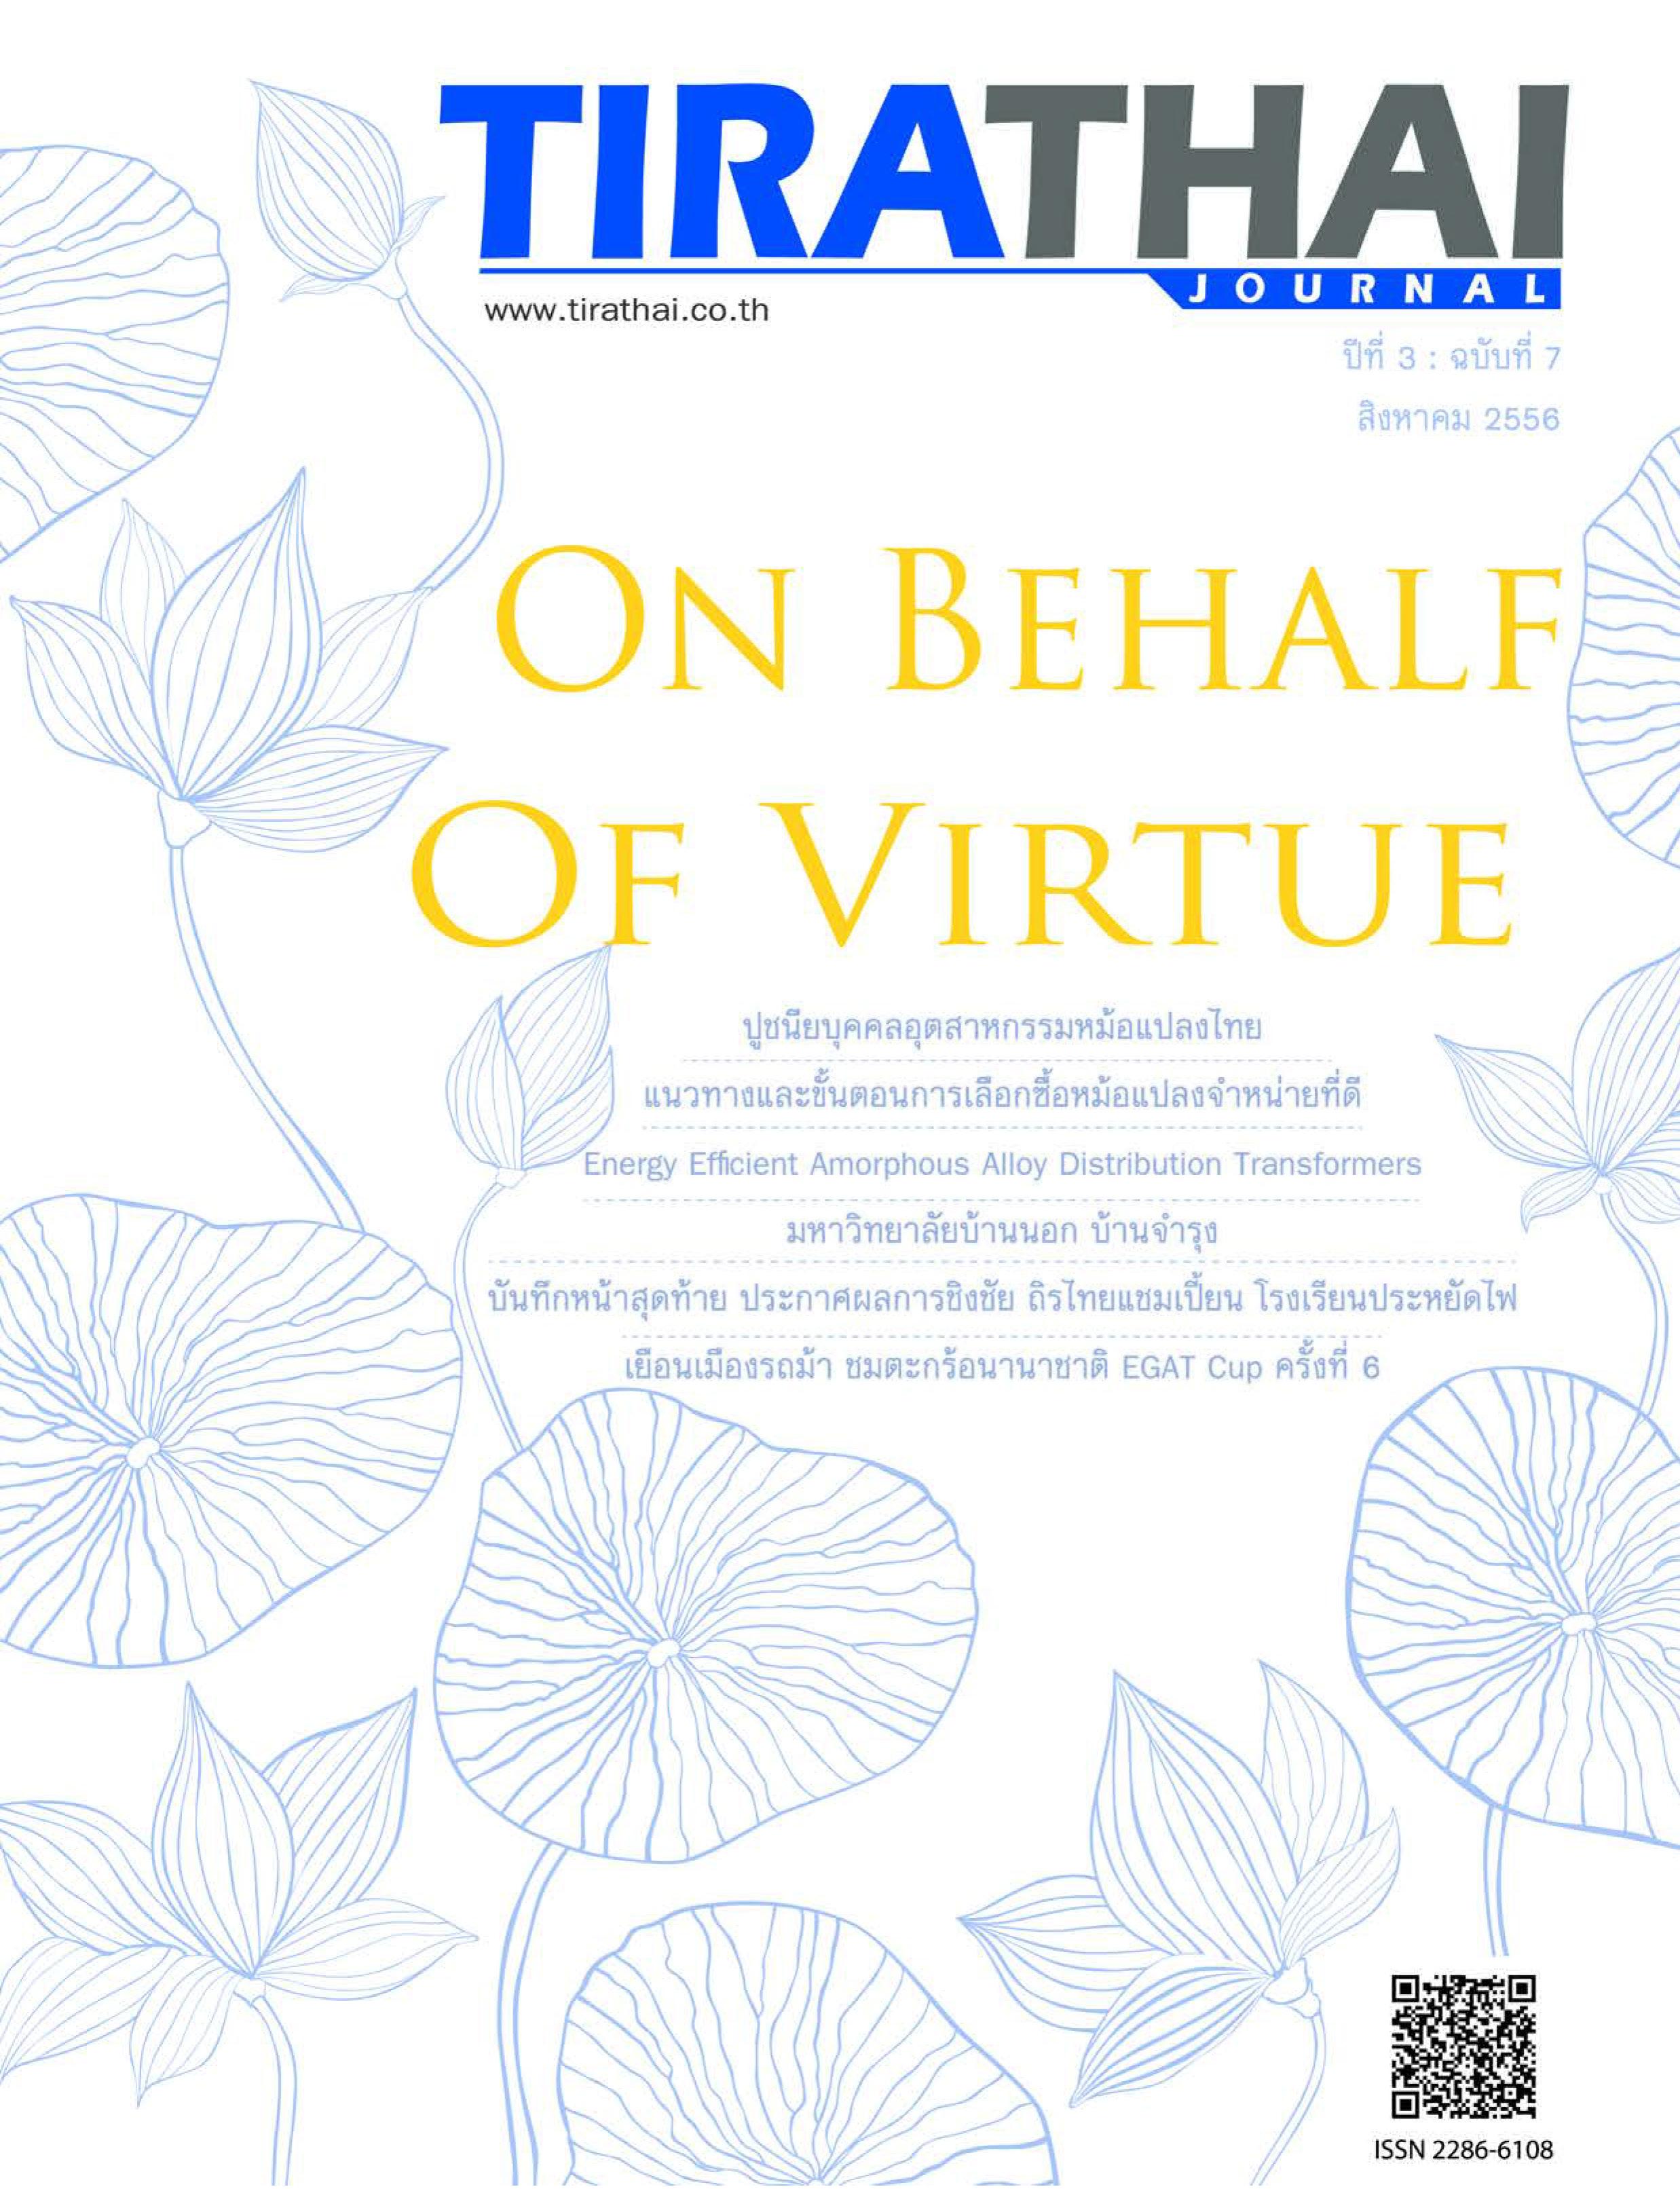 ON BEHALF OF VIRTUE